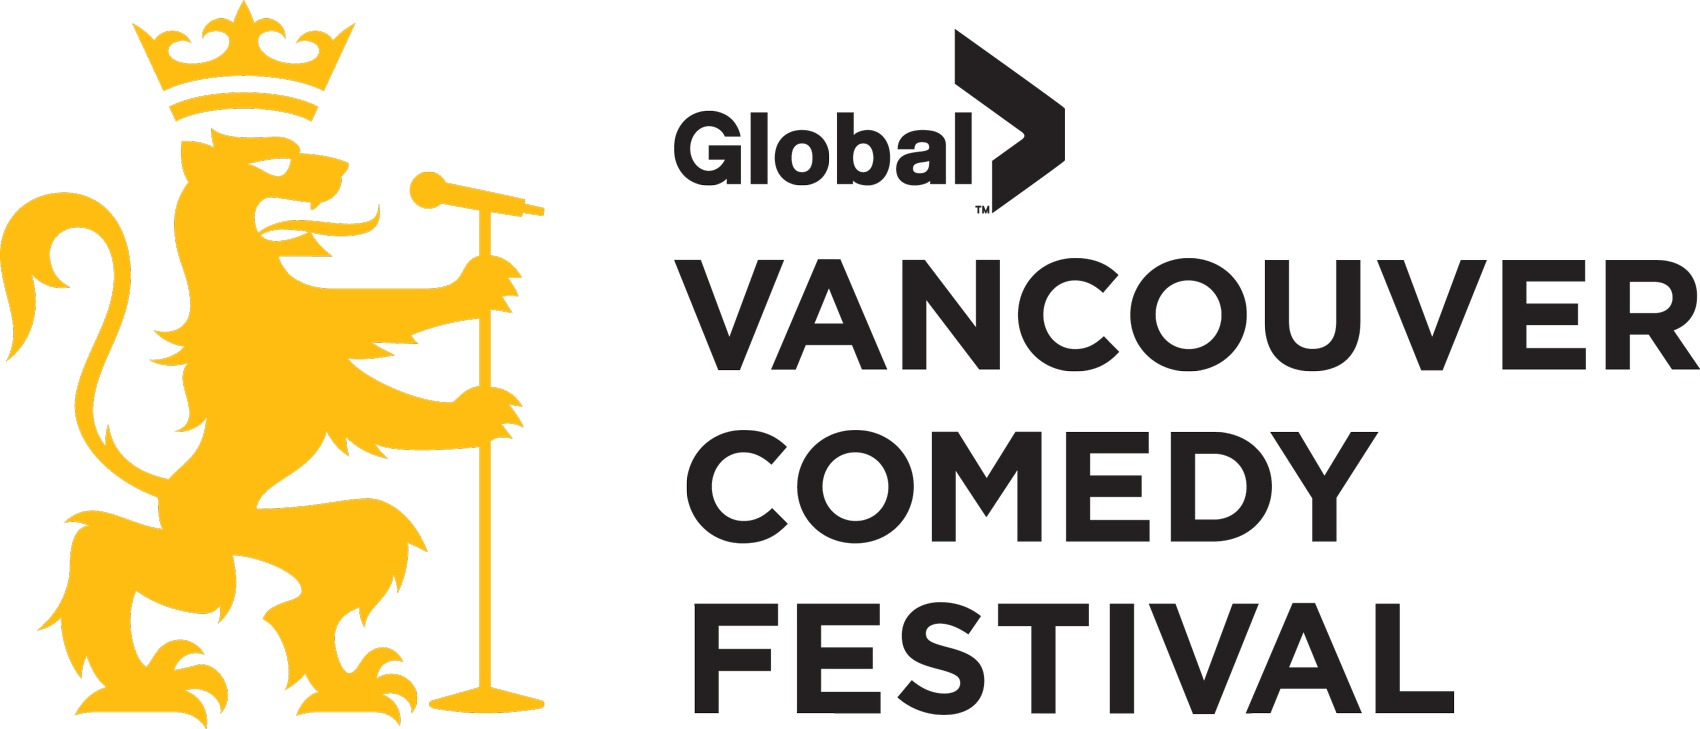 Vancouver Comedy Festival logo